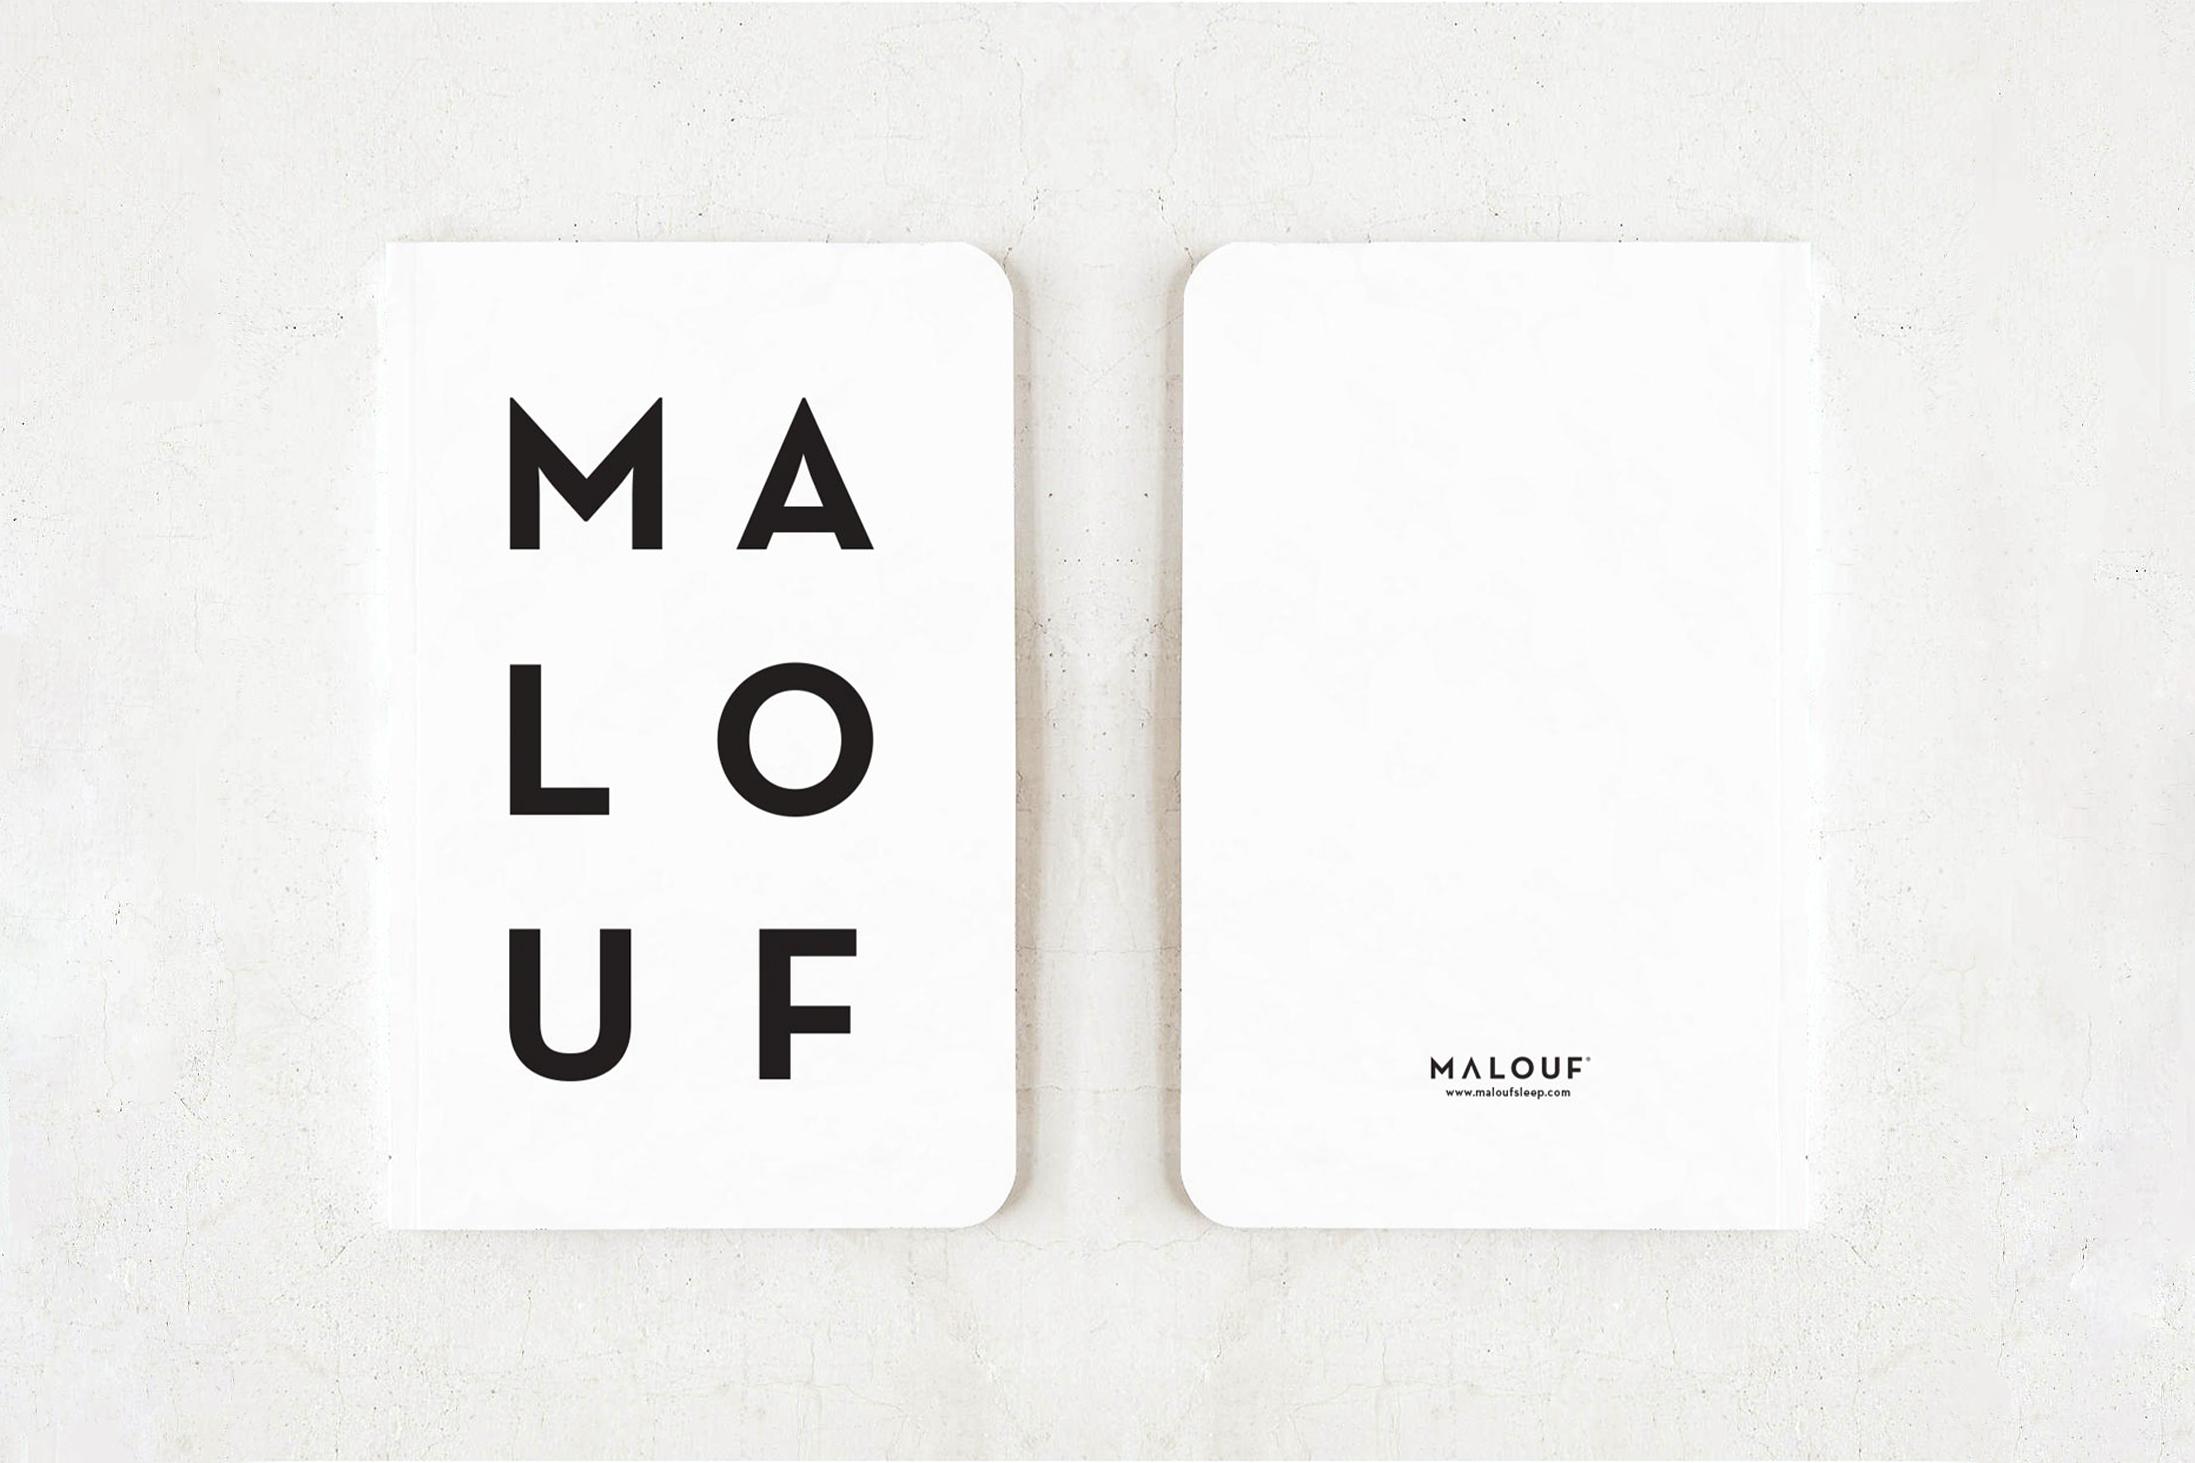 MALOUF_Notebooks_Option4.jpg